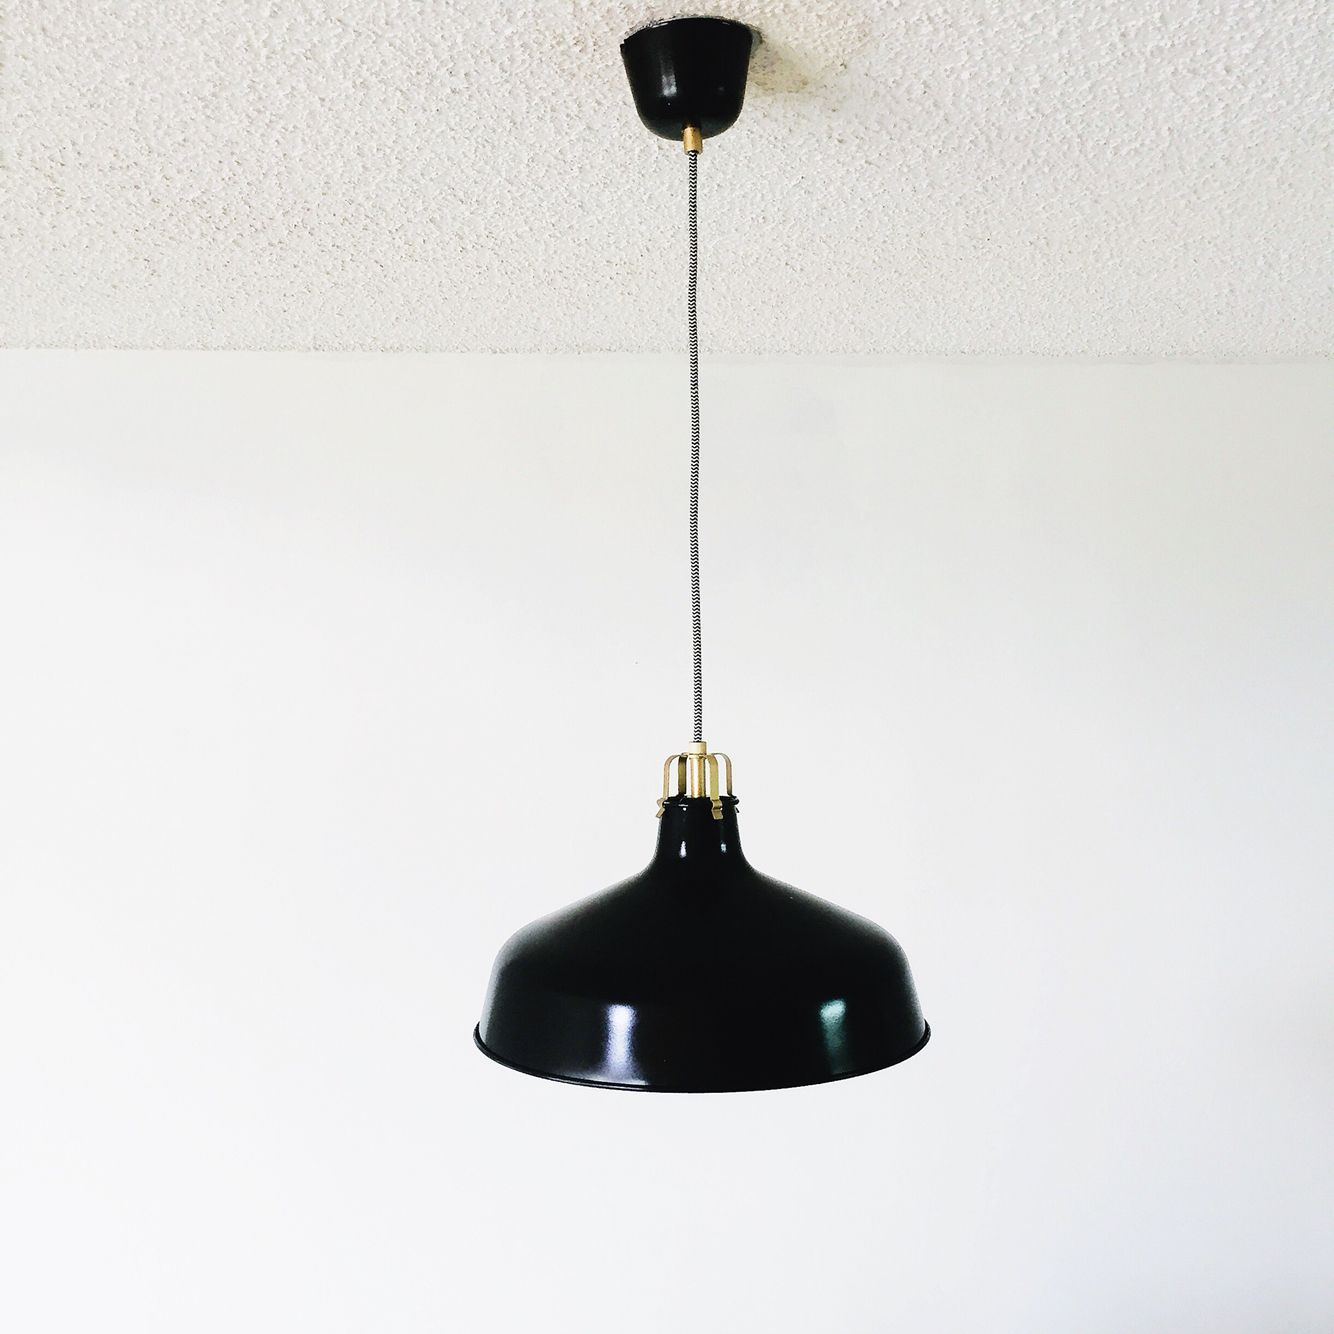 Ranarp Pendant Lamp Black 38 Cm: RANARP IKEA Ceiling Pendant Light. Spray Painted Black